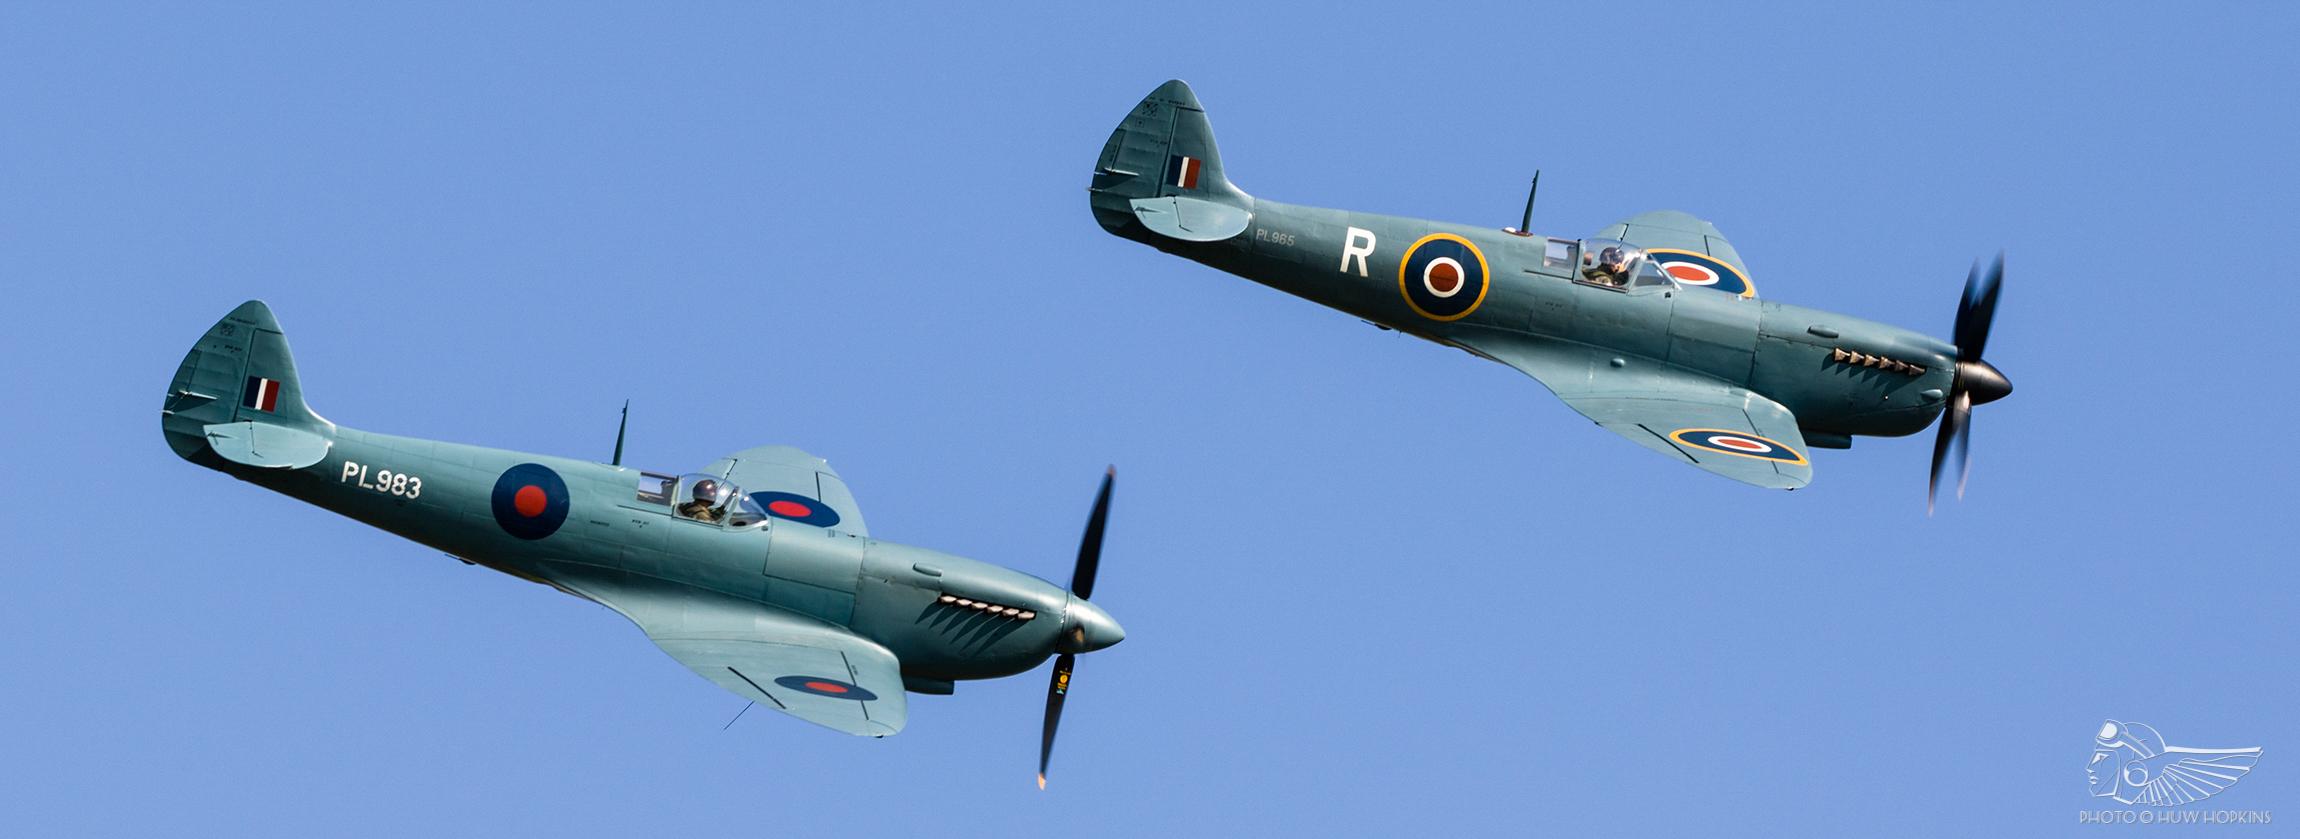 PR.XI Spitfires snap up the limelight at Shuttleworth